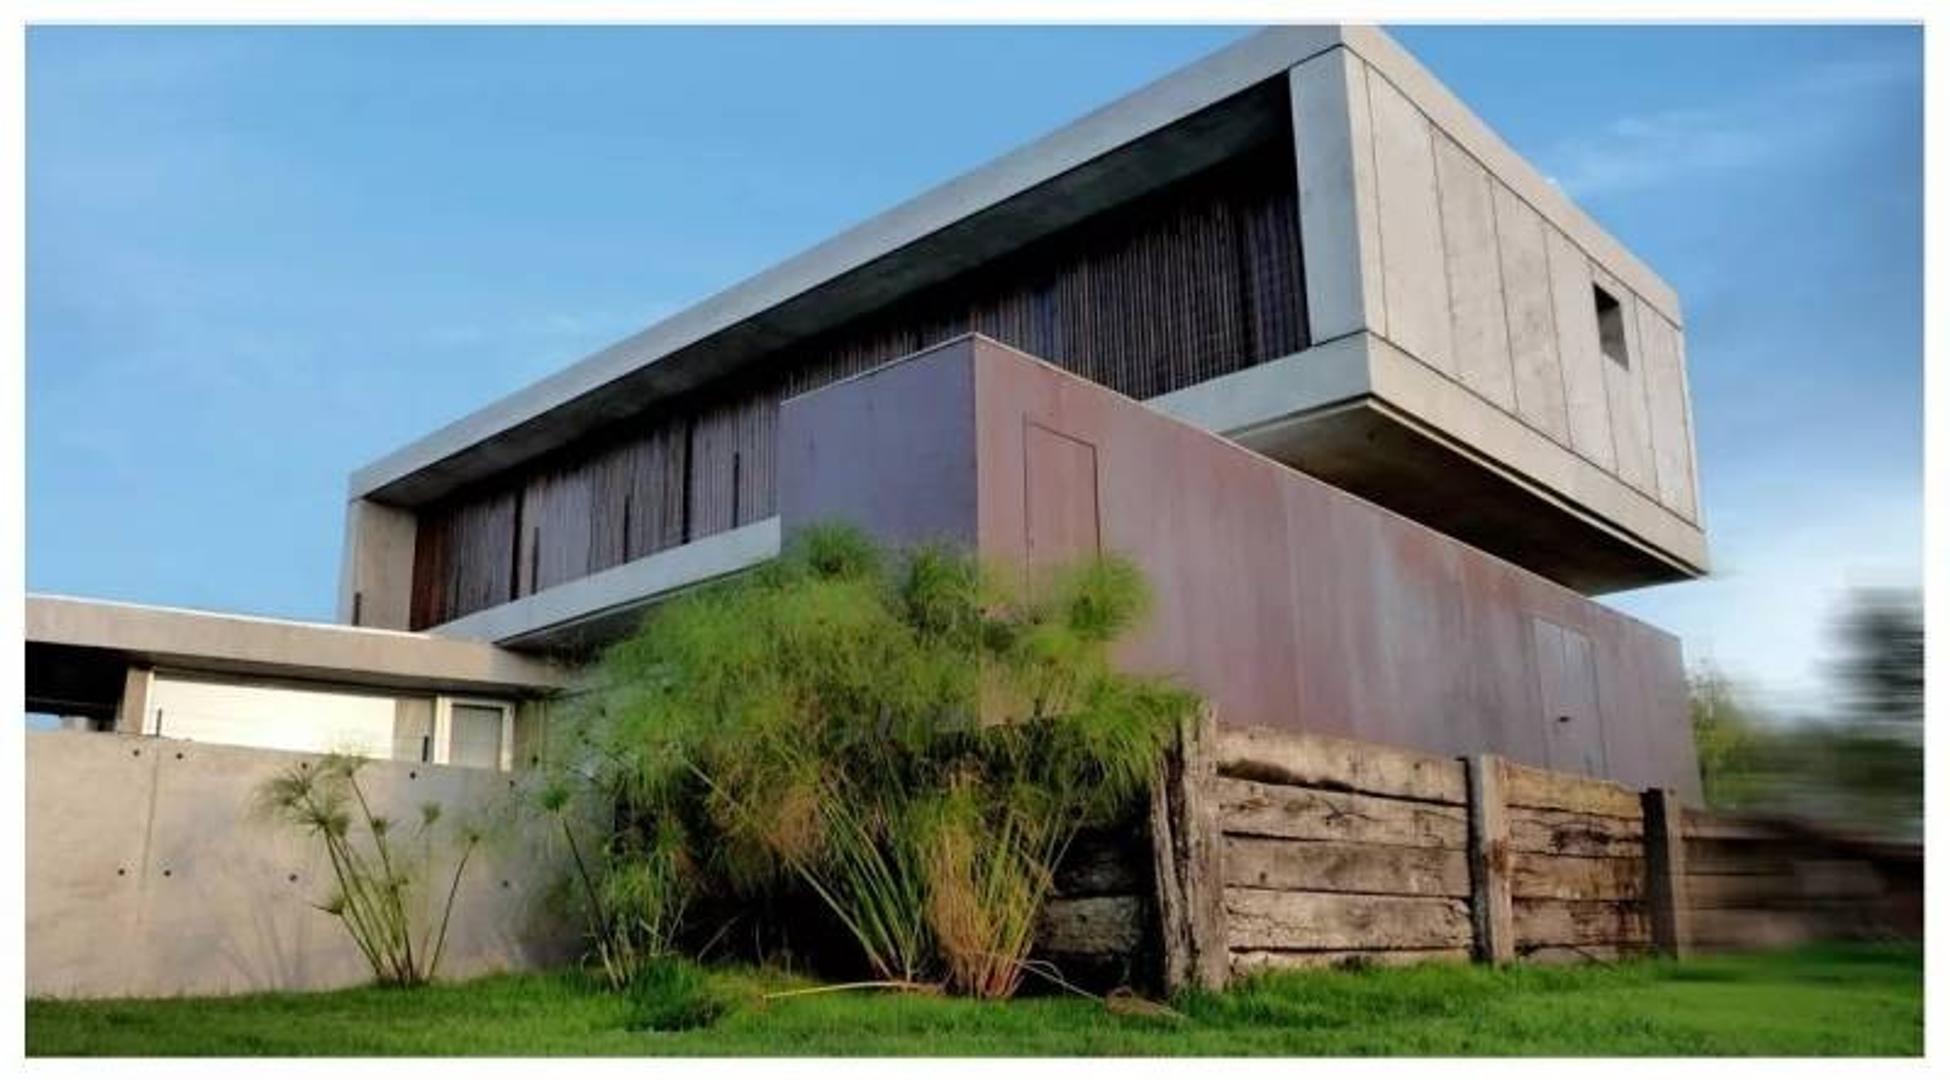 Susana Aravena Propiedades FV Espectacular casa en venta a la laguna en Tigre San Marco Villanueva